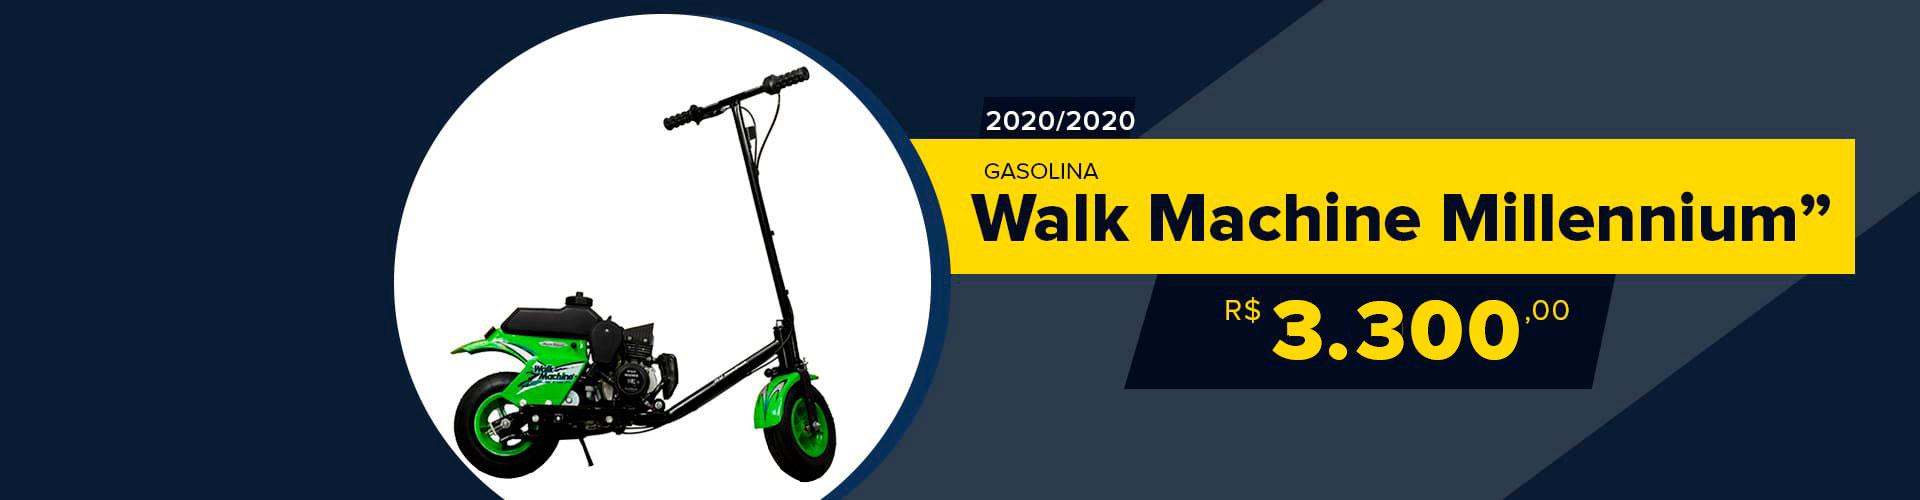 WALK MACHINE